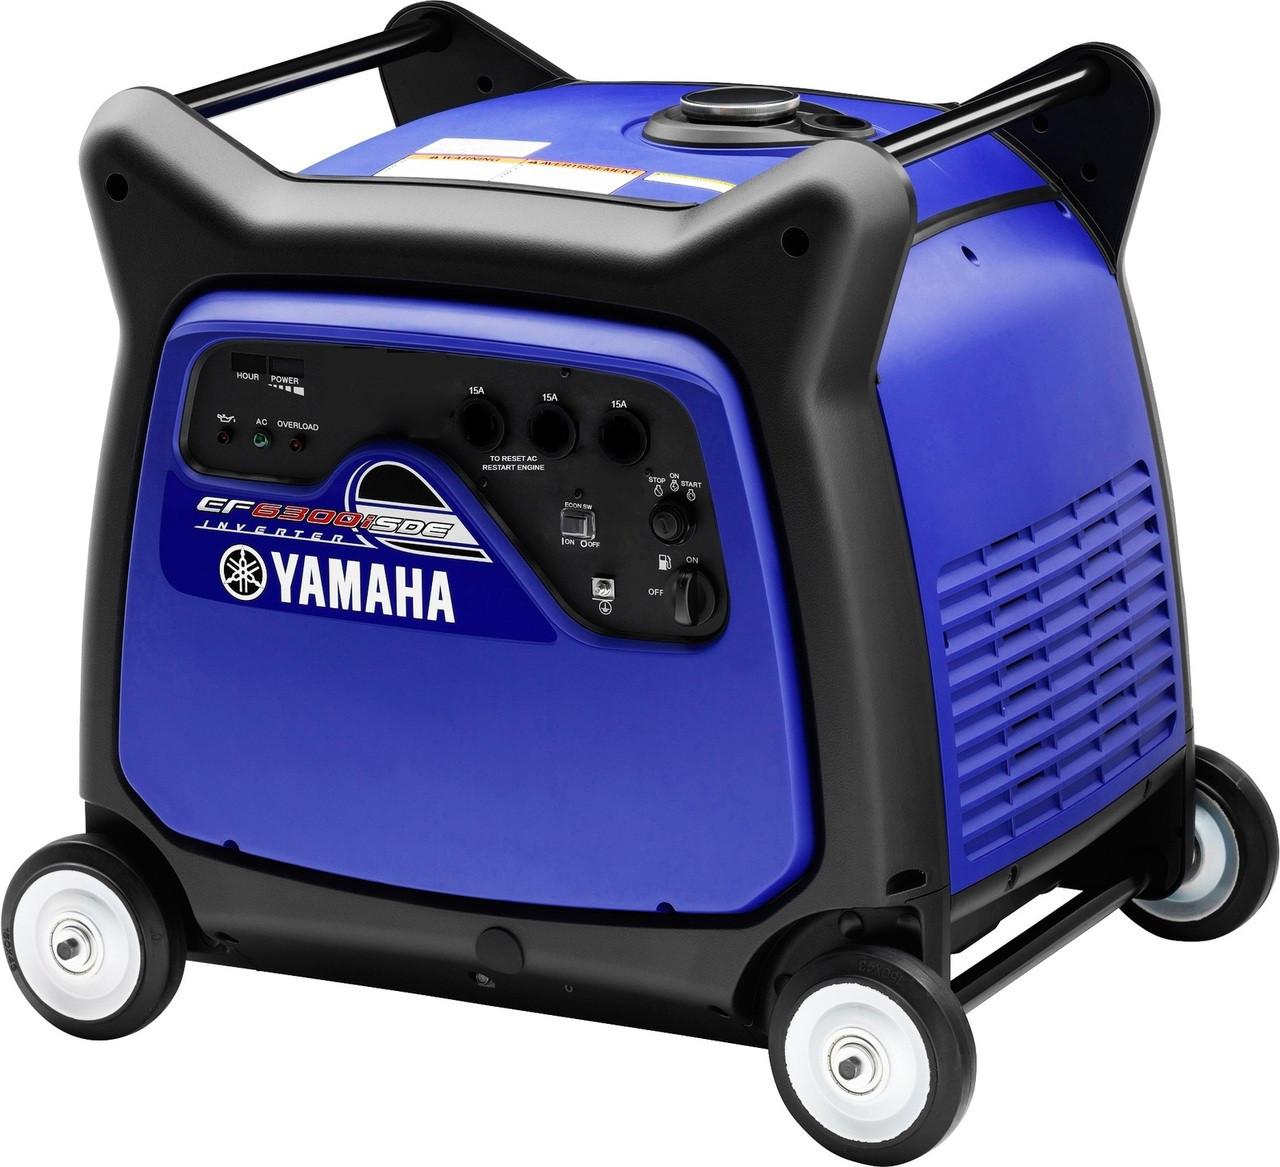 Yamaha ef6300ise 6 3 kva inverter generator haughton honda for Yamaha inverter generator vs honda